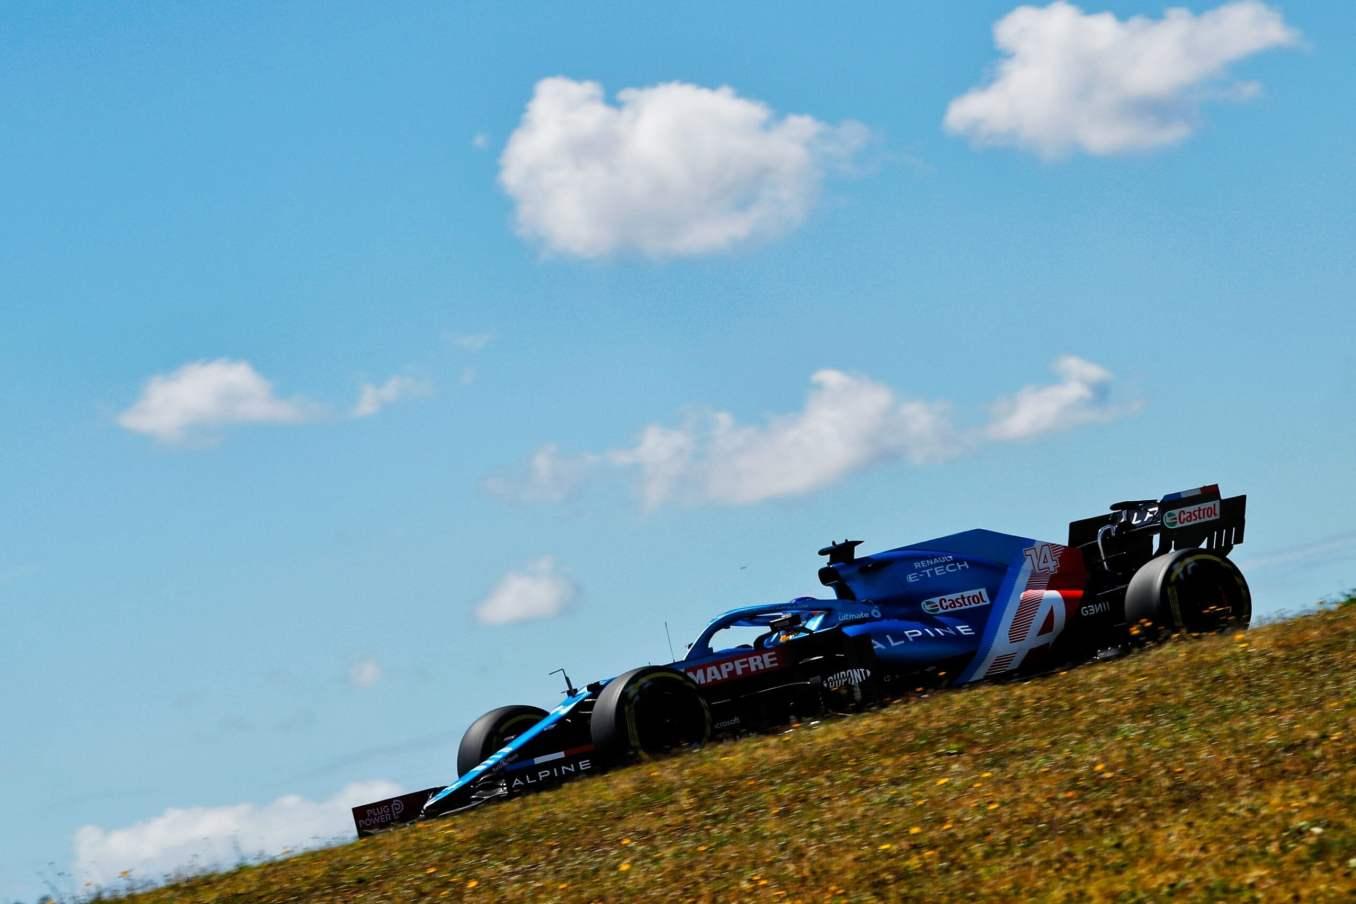 Alpine F1 Team GRAND PRIX HEINEKEN DU PORTUGAL Alonso Ocon 2021 A521 28 scaled   Alpine F1 Team : des essais convaincants au Grand Prix Heineken du Portugal